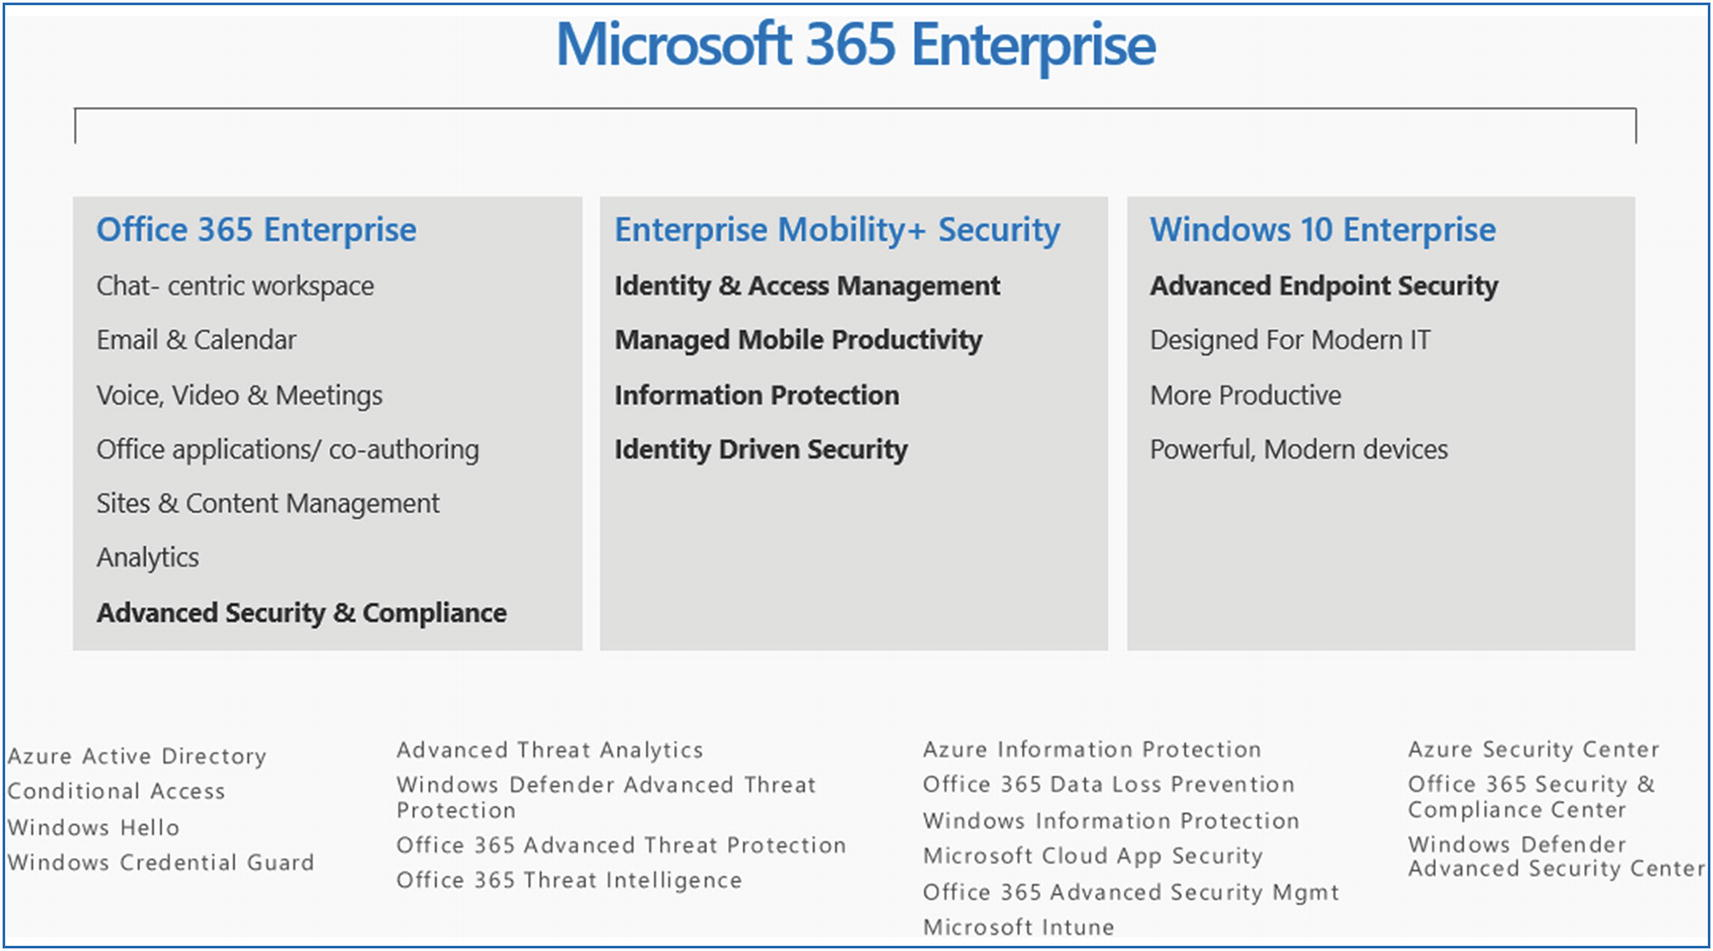 Azure and Office 365 Security | SpringerLink